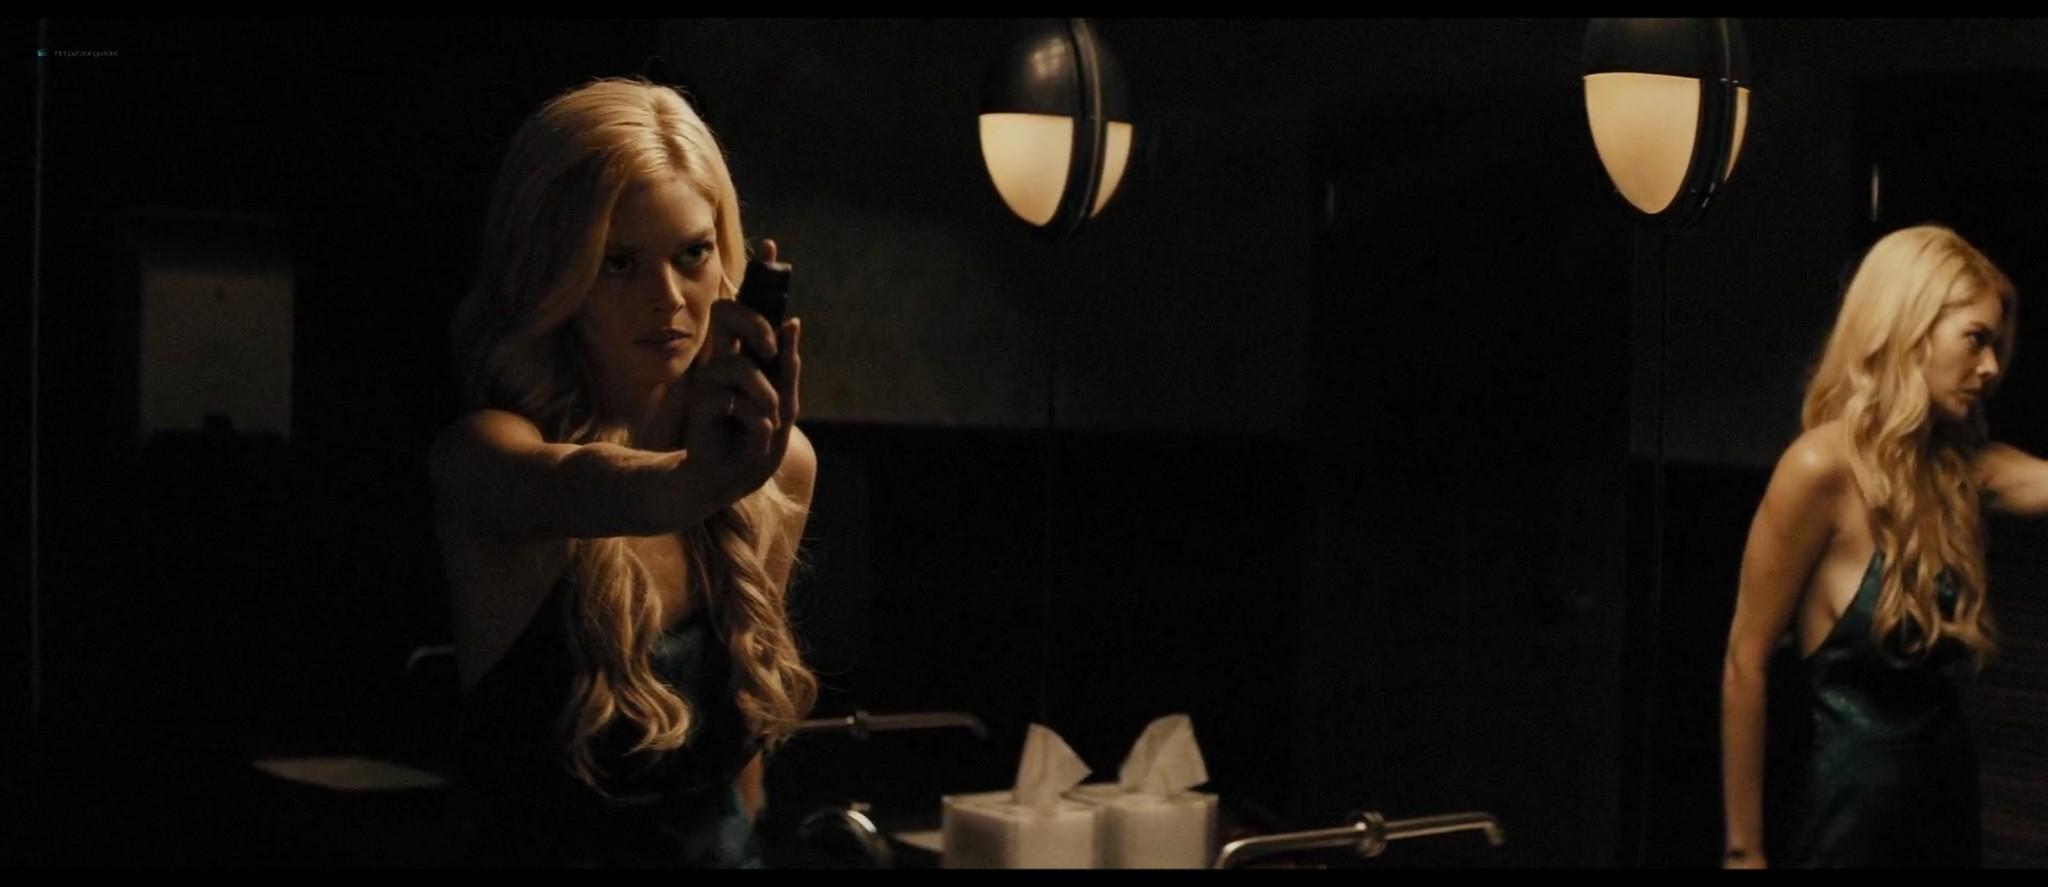 Samara Weaving nude butt and boobs Carly Chaikin sexy - Last Moment of Clarity (2020) HD 1080p (10)